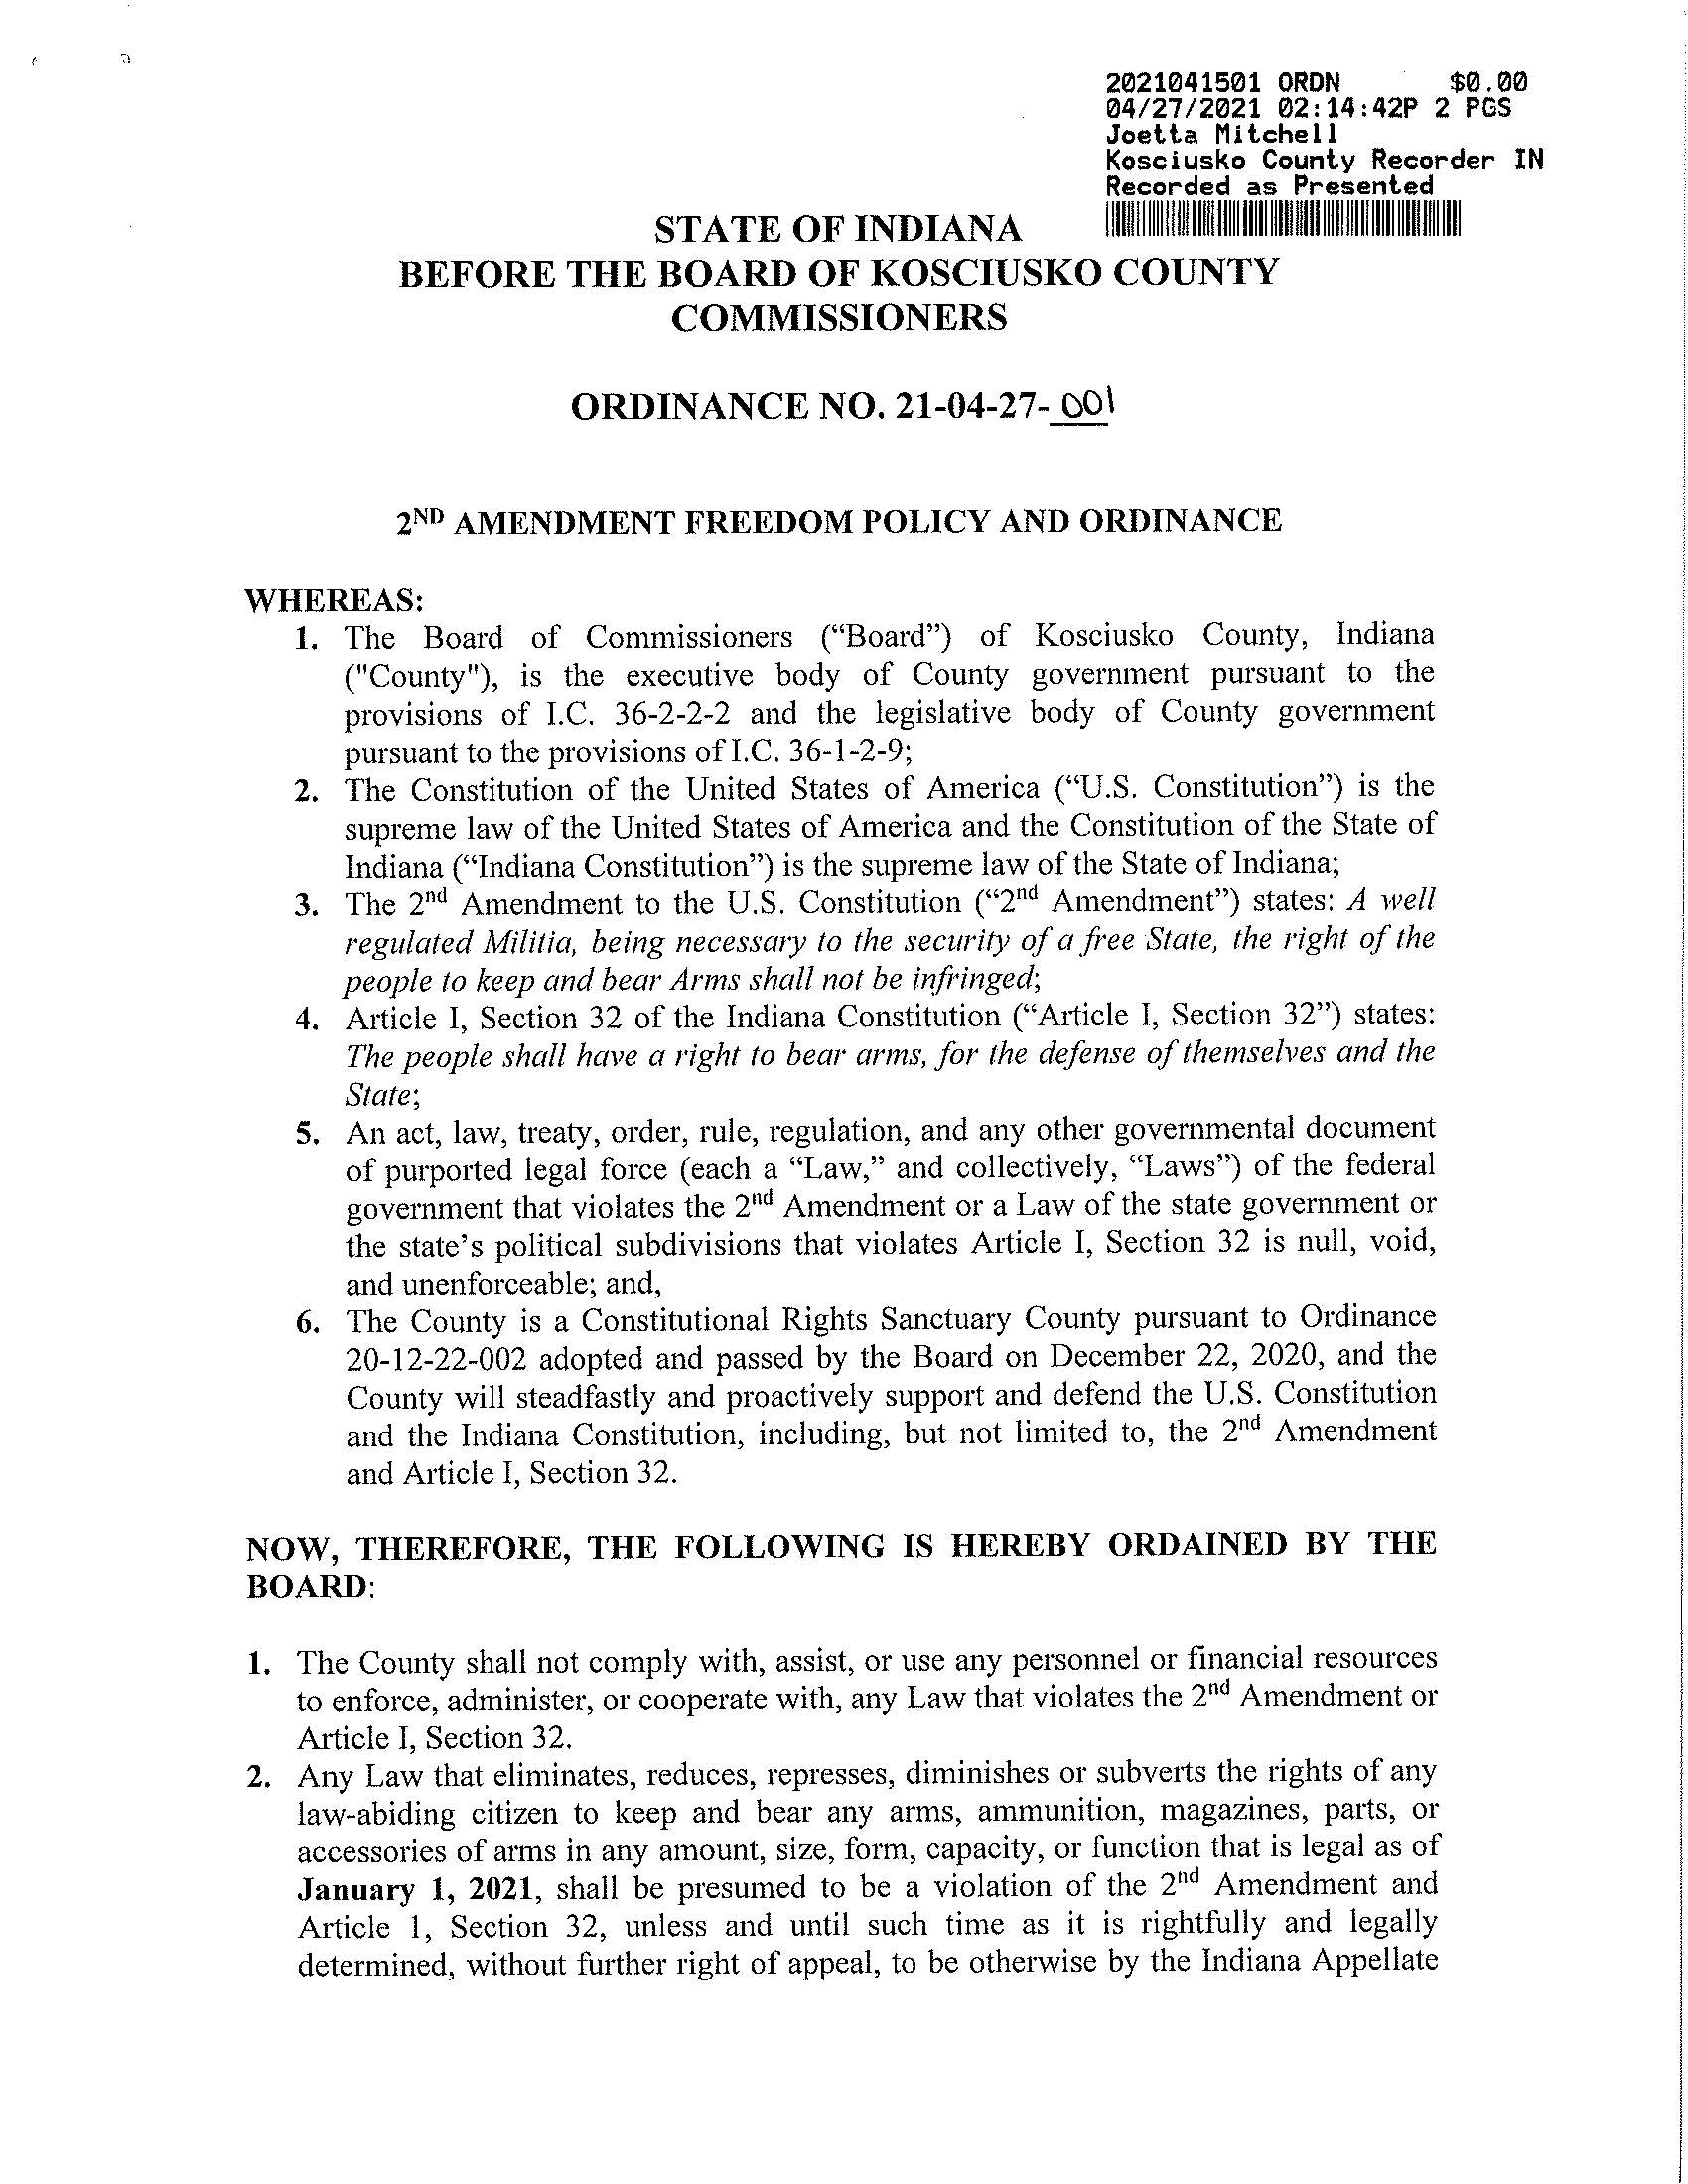 2nd Amendment Freedom Policy Ordiance Kosciusko Indiana Page 1